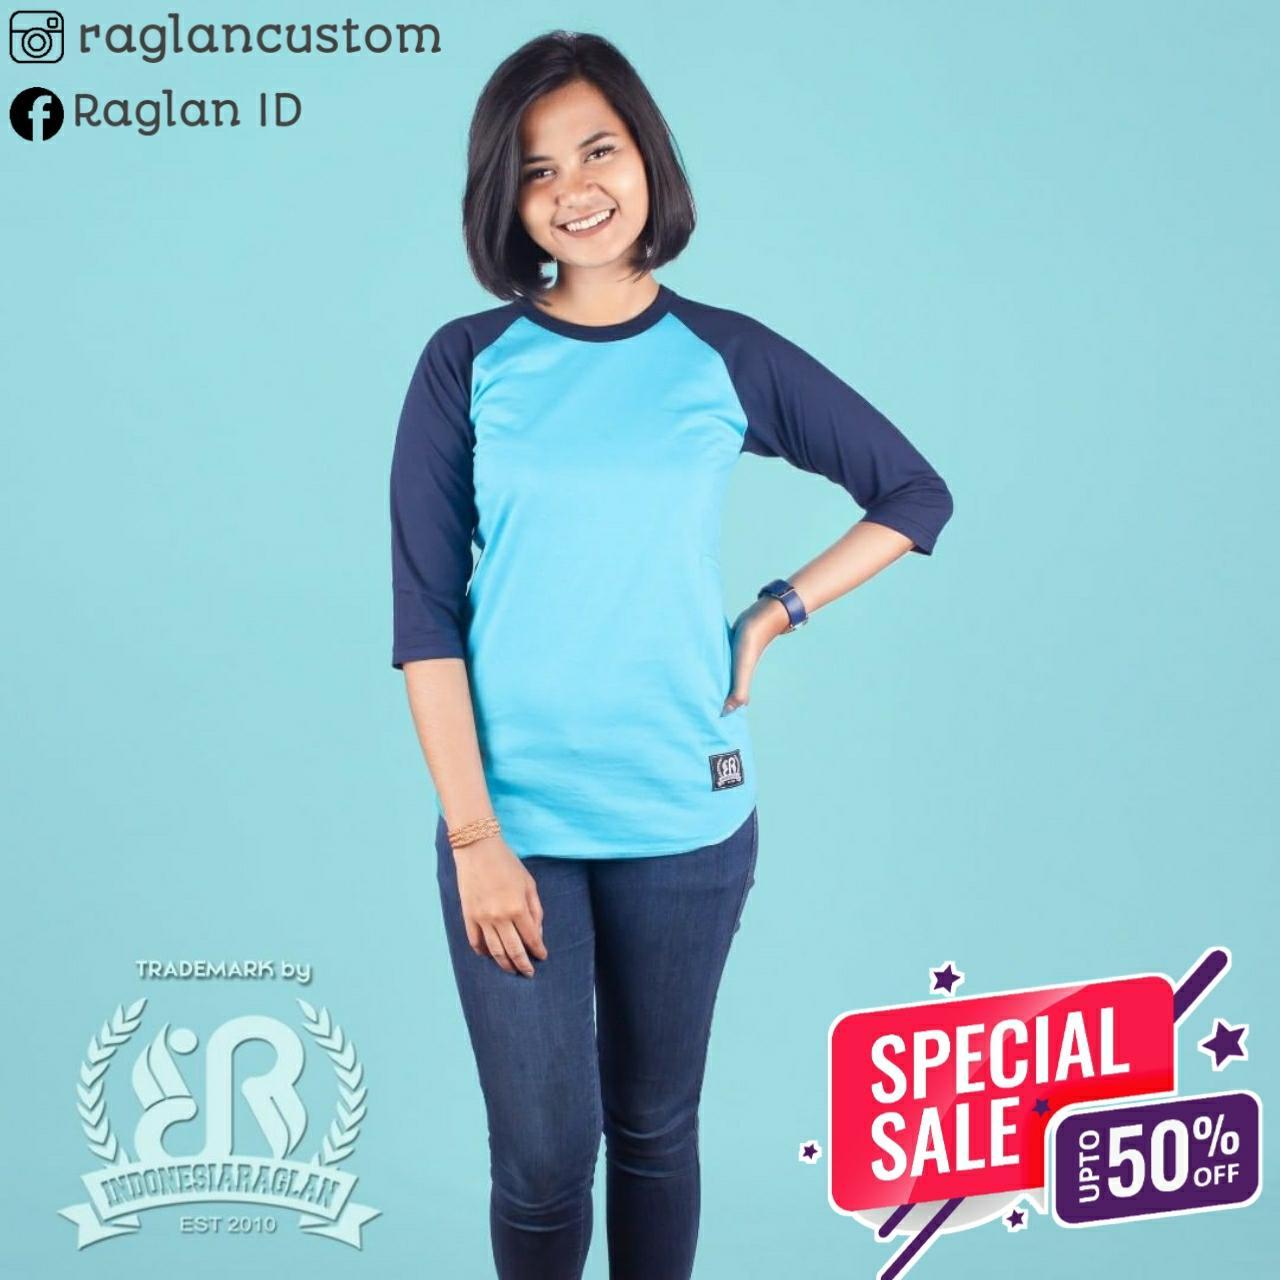 [COD] Kaos Raglan IDR Indonesia Raglan Baby Dongker Combed 30s Kualitas Premium Basic Dewasa 3/4 atau Panjang dan basic Anak